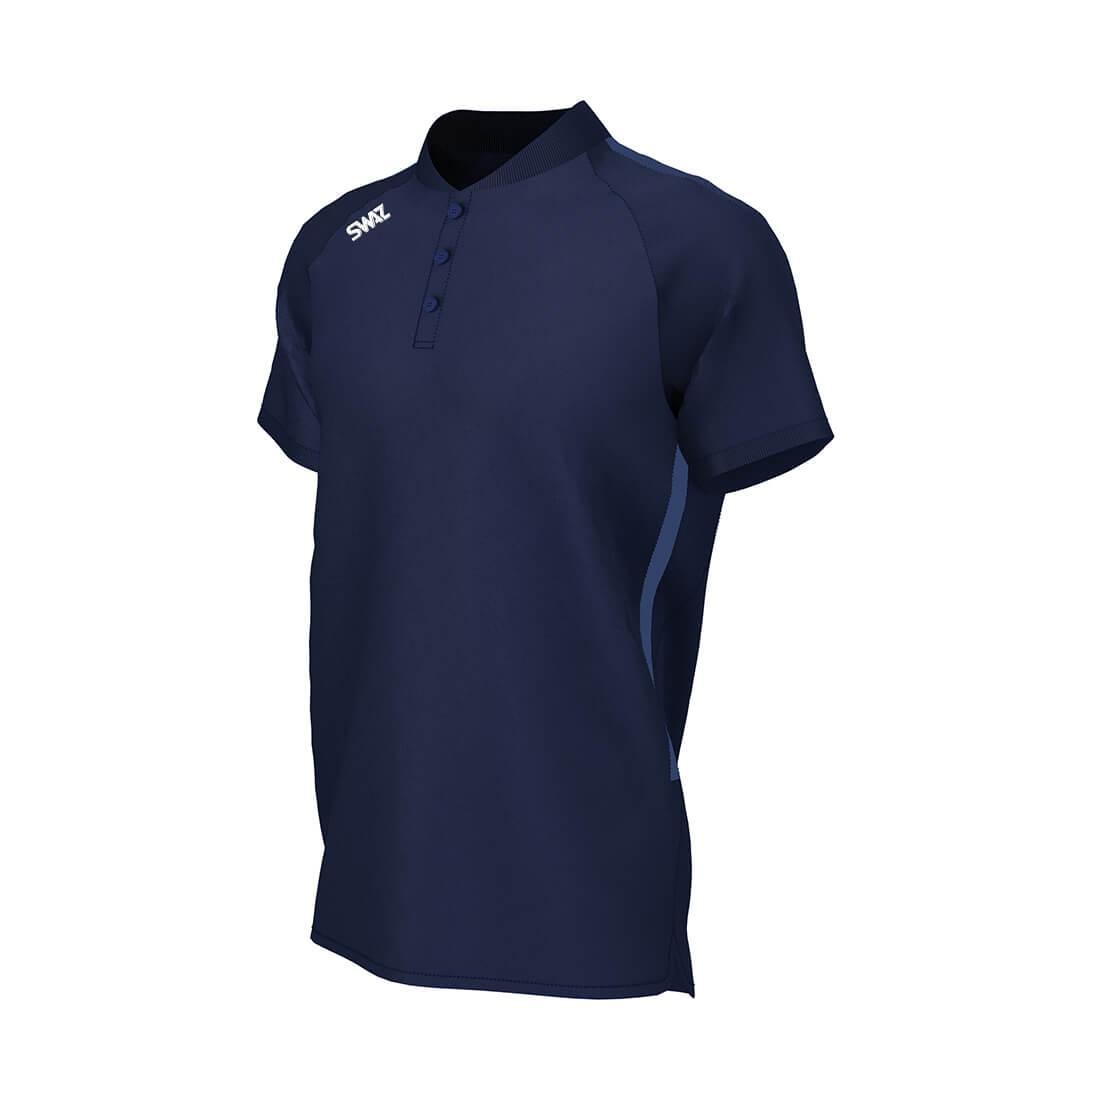 Elite Youth Football Polo Shirts | Football Training Kit and Teamwear – SWAZ